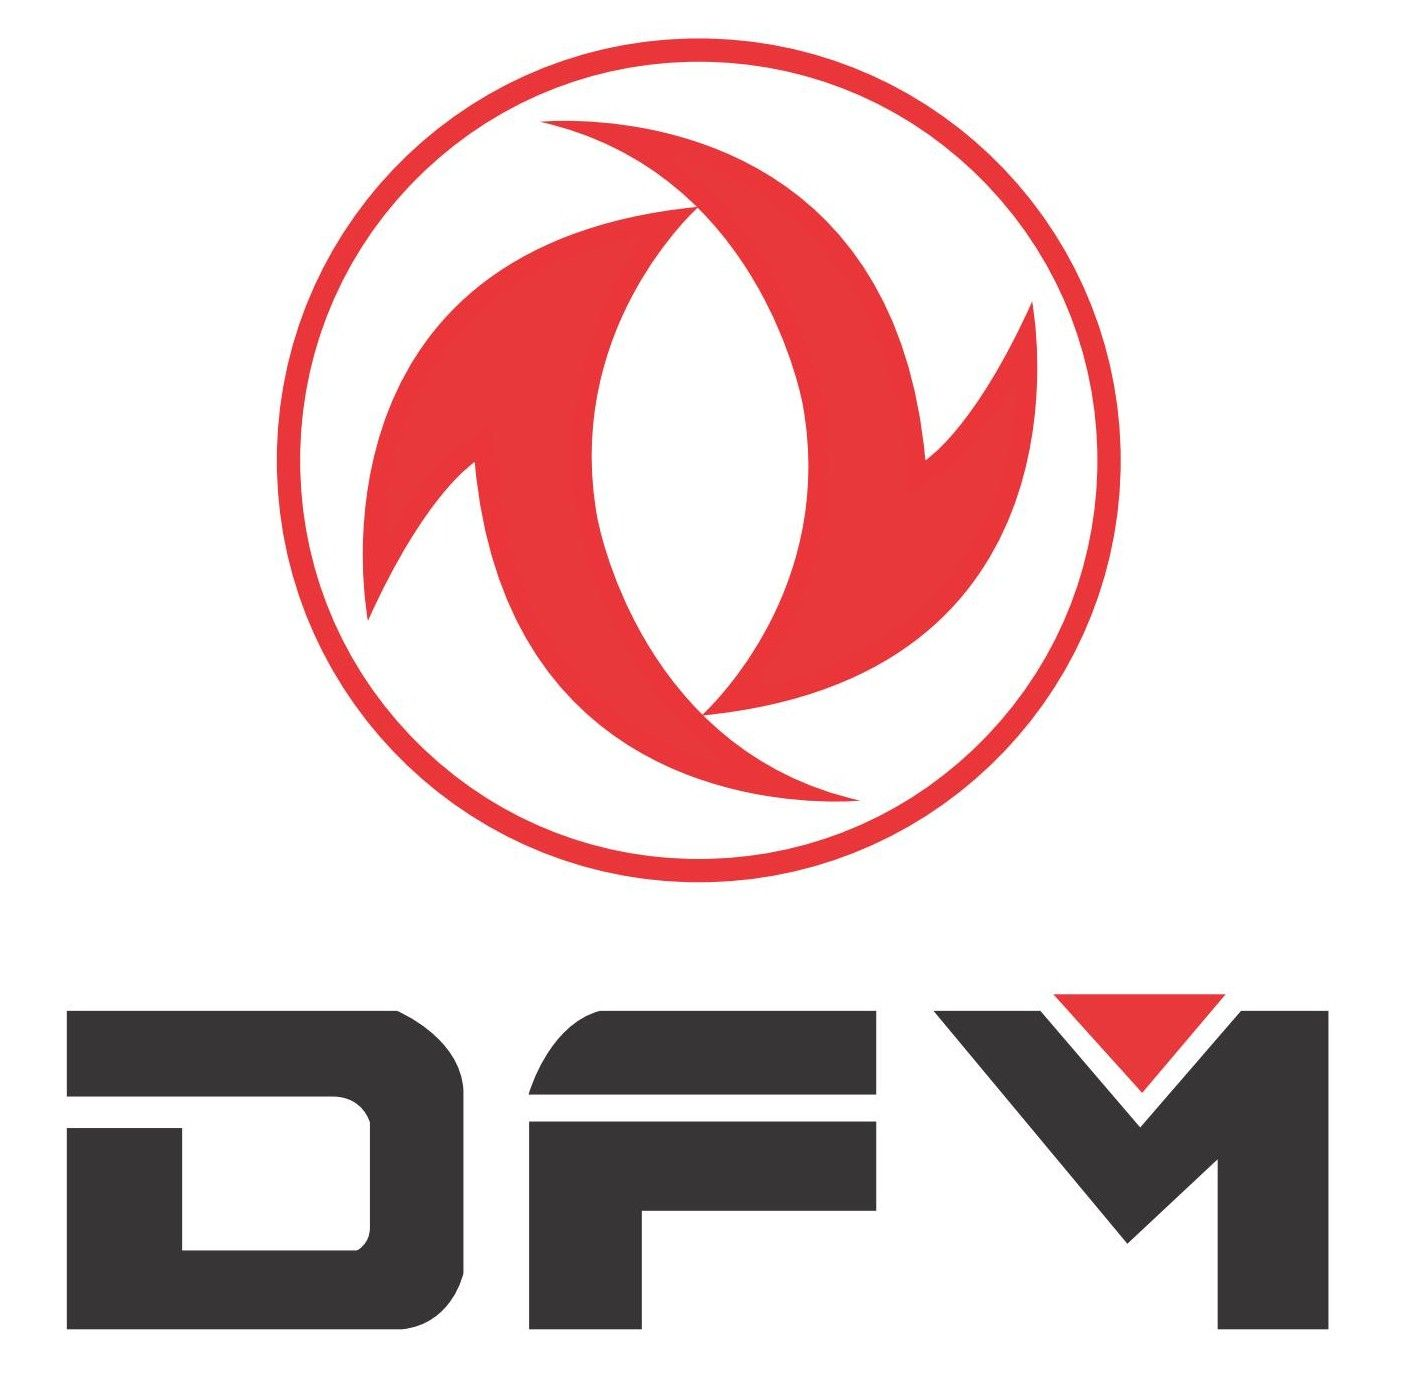 dfm dongfeng motor logo eps pdf car and motorcycle logos rh pinterest com Cool Car Shop Logo Old School Automotive Logos